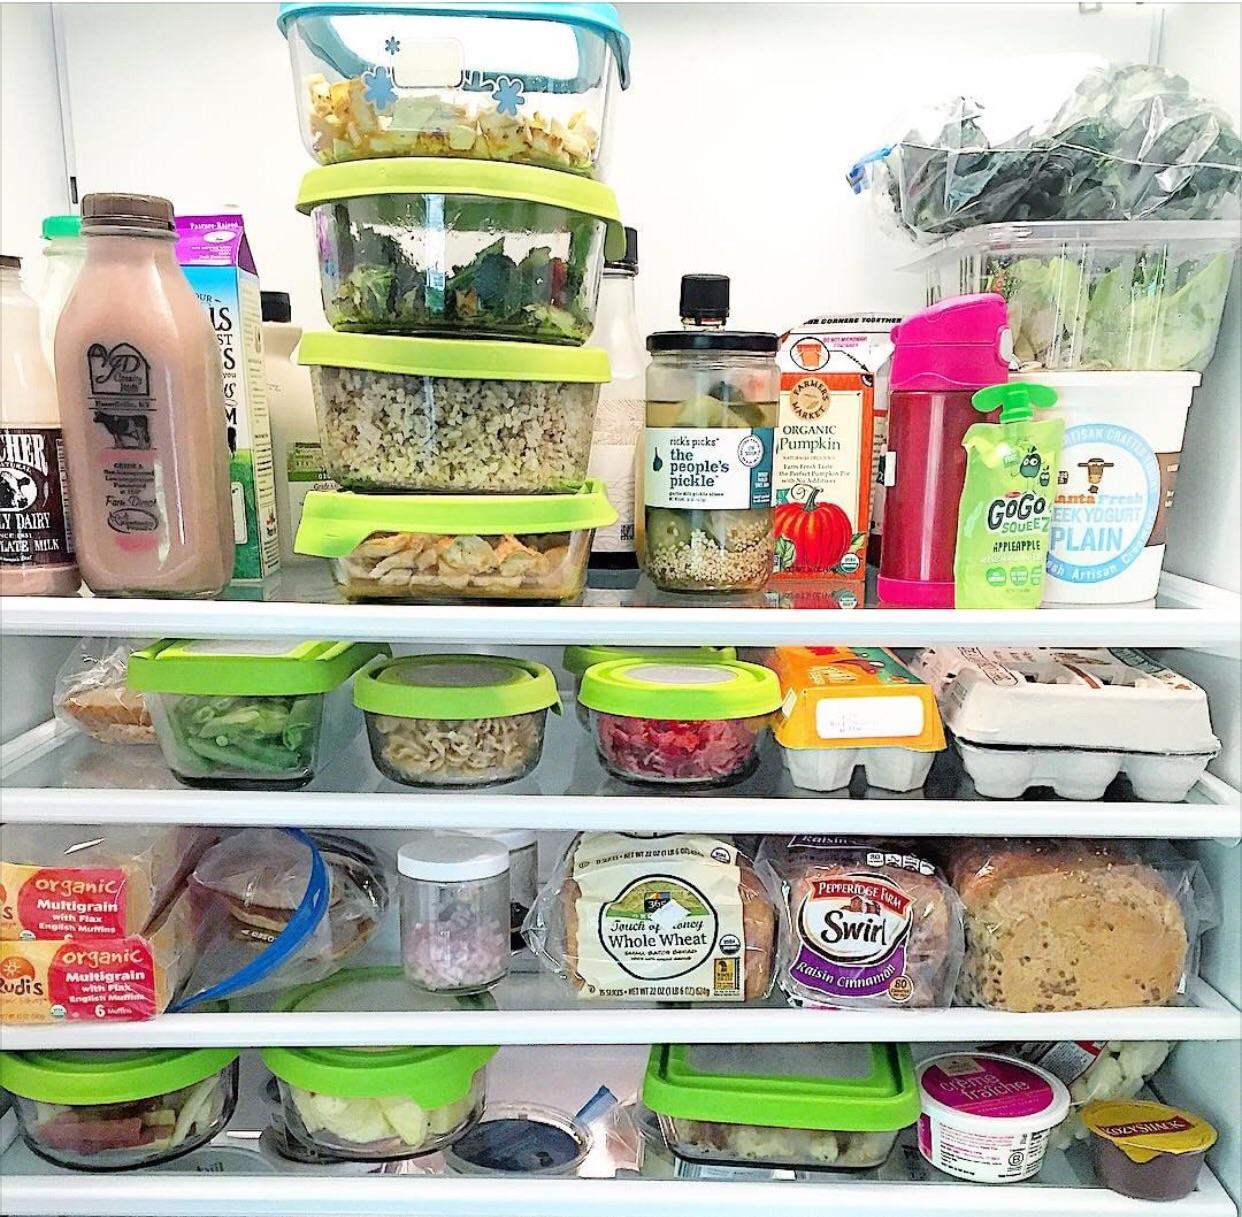 Melissa's fridge. Carb shelf envy, right?